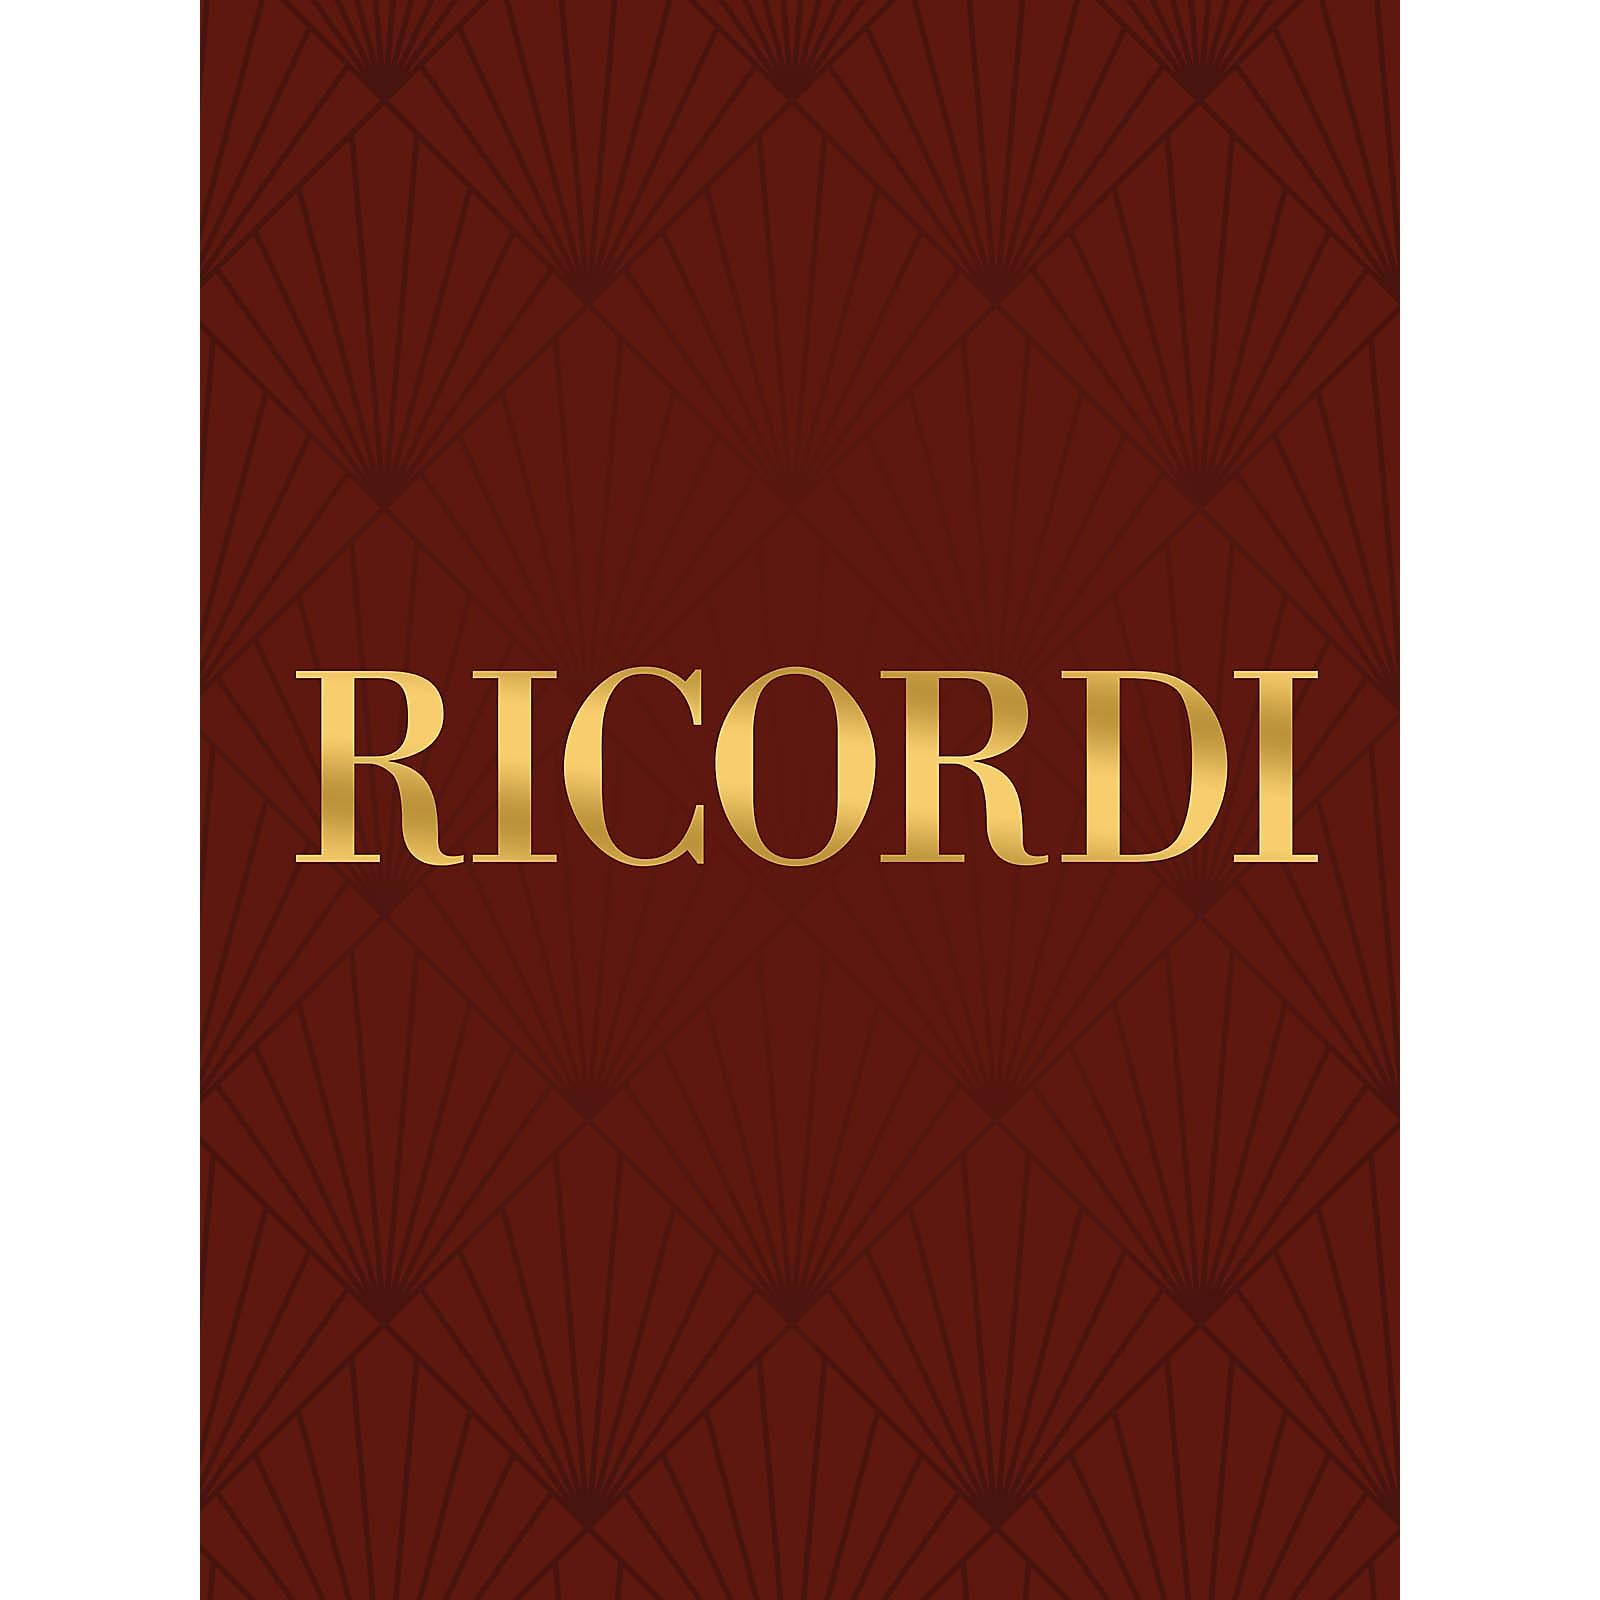 Ricordi Momento (Voice and Piano) Vocal Solo Series Composed by Elsa Olivieri Sangiacomo Respighi